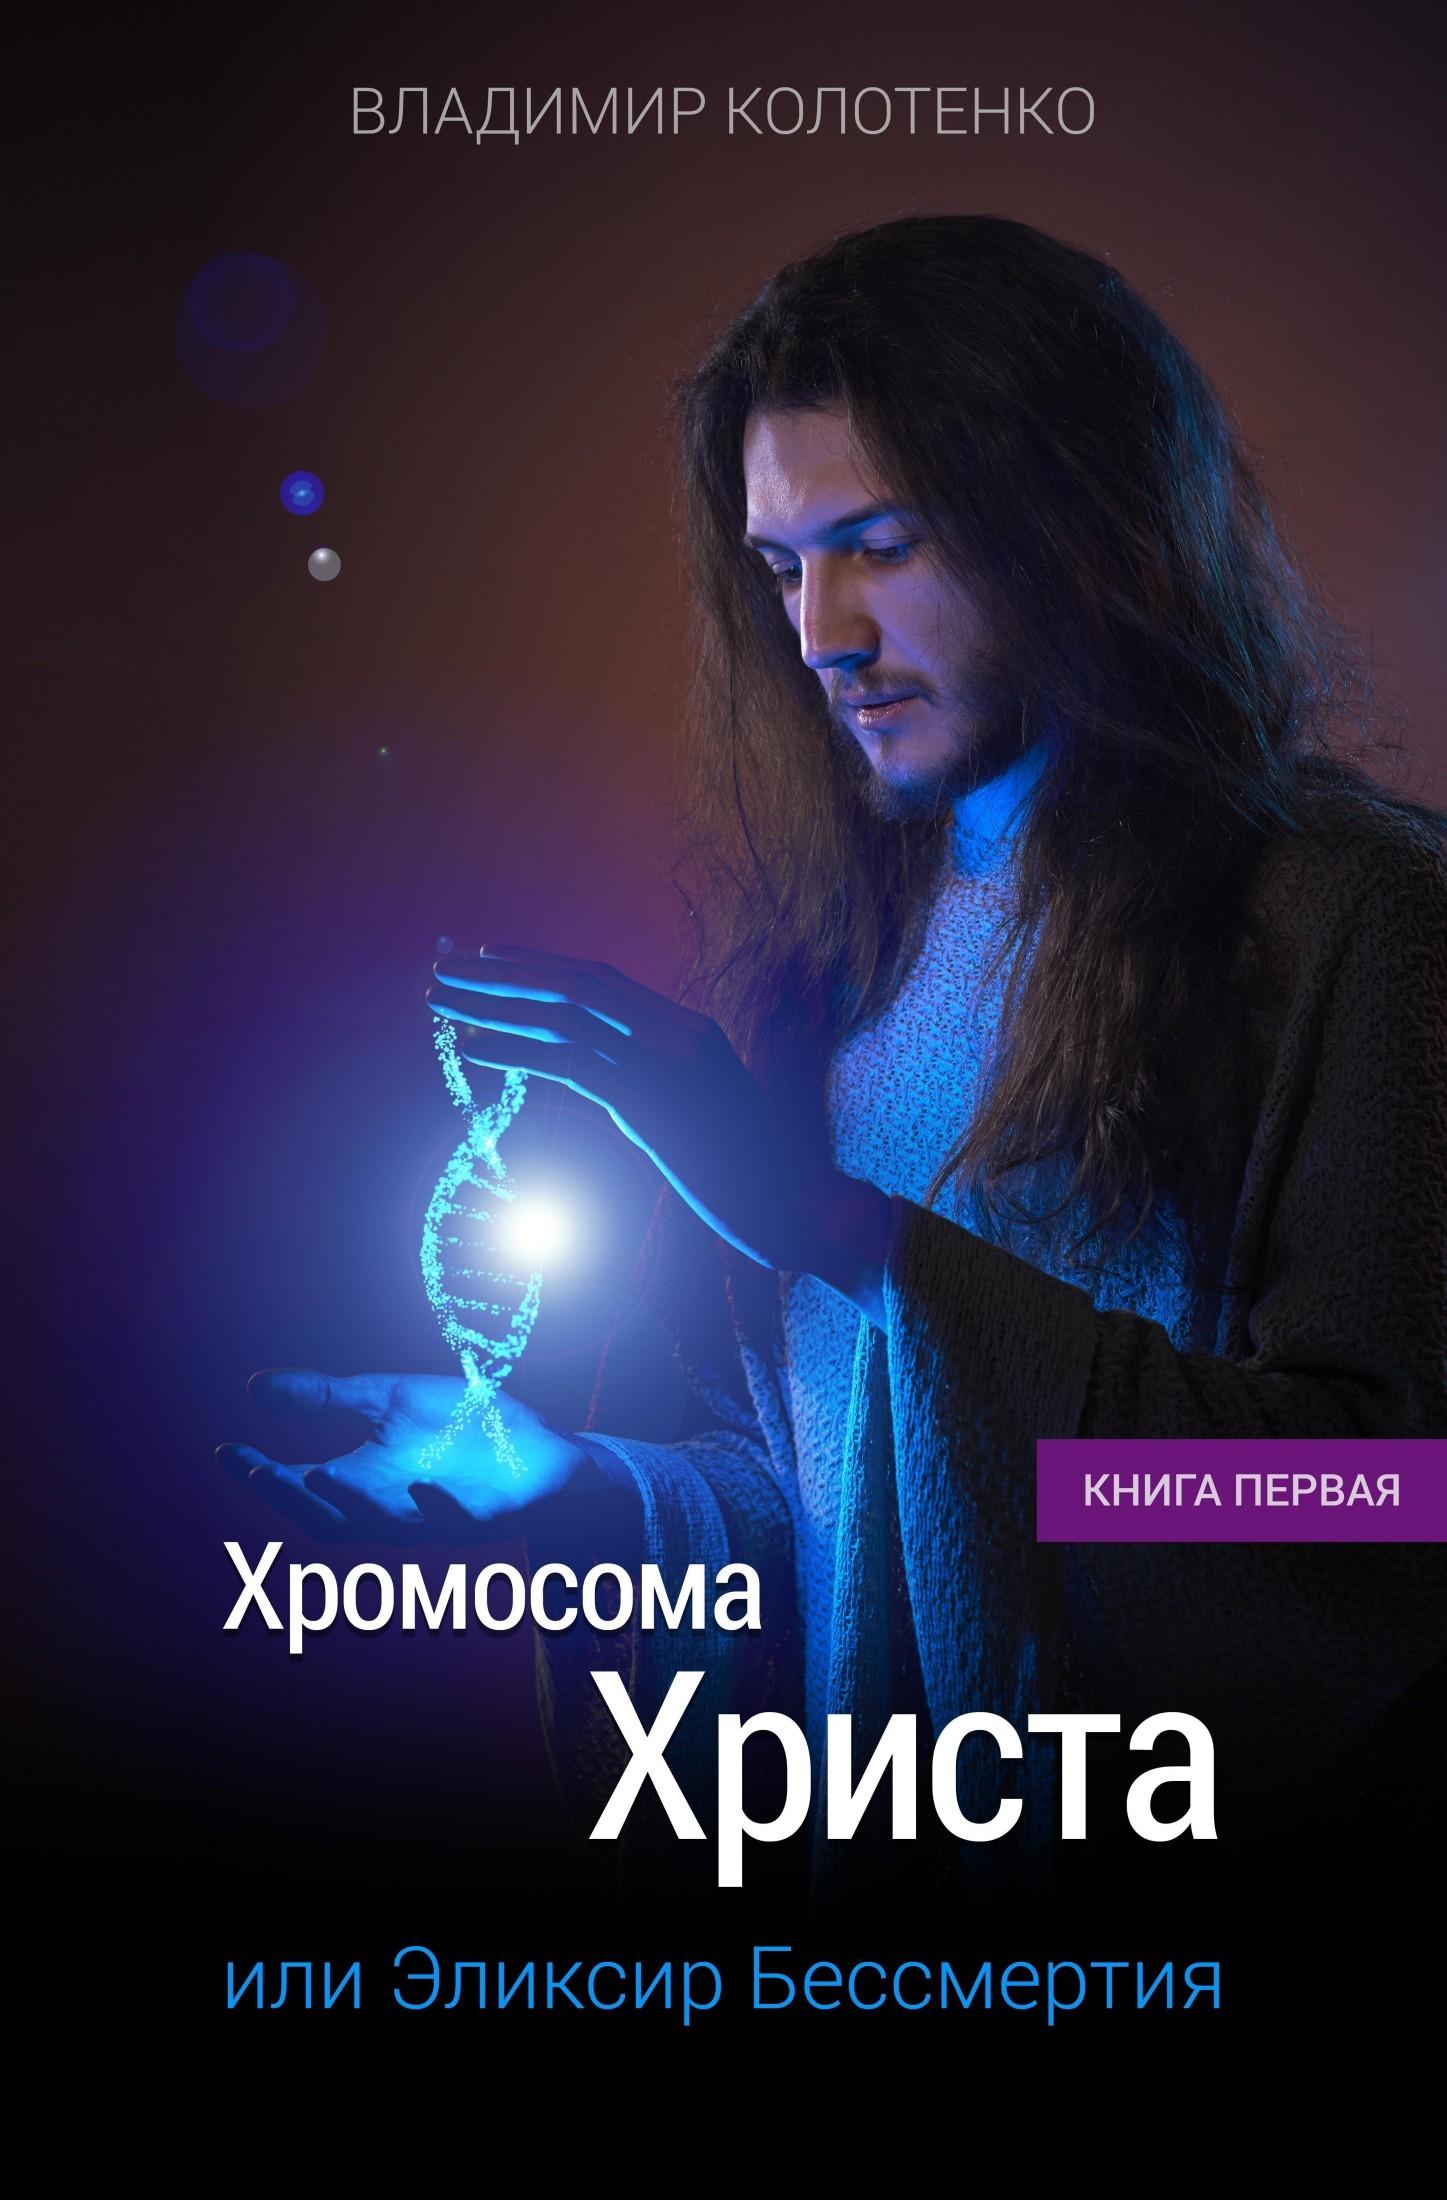 Владимир Колотенко - Хромосома Христа